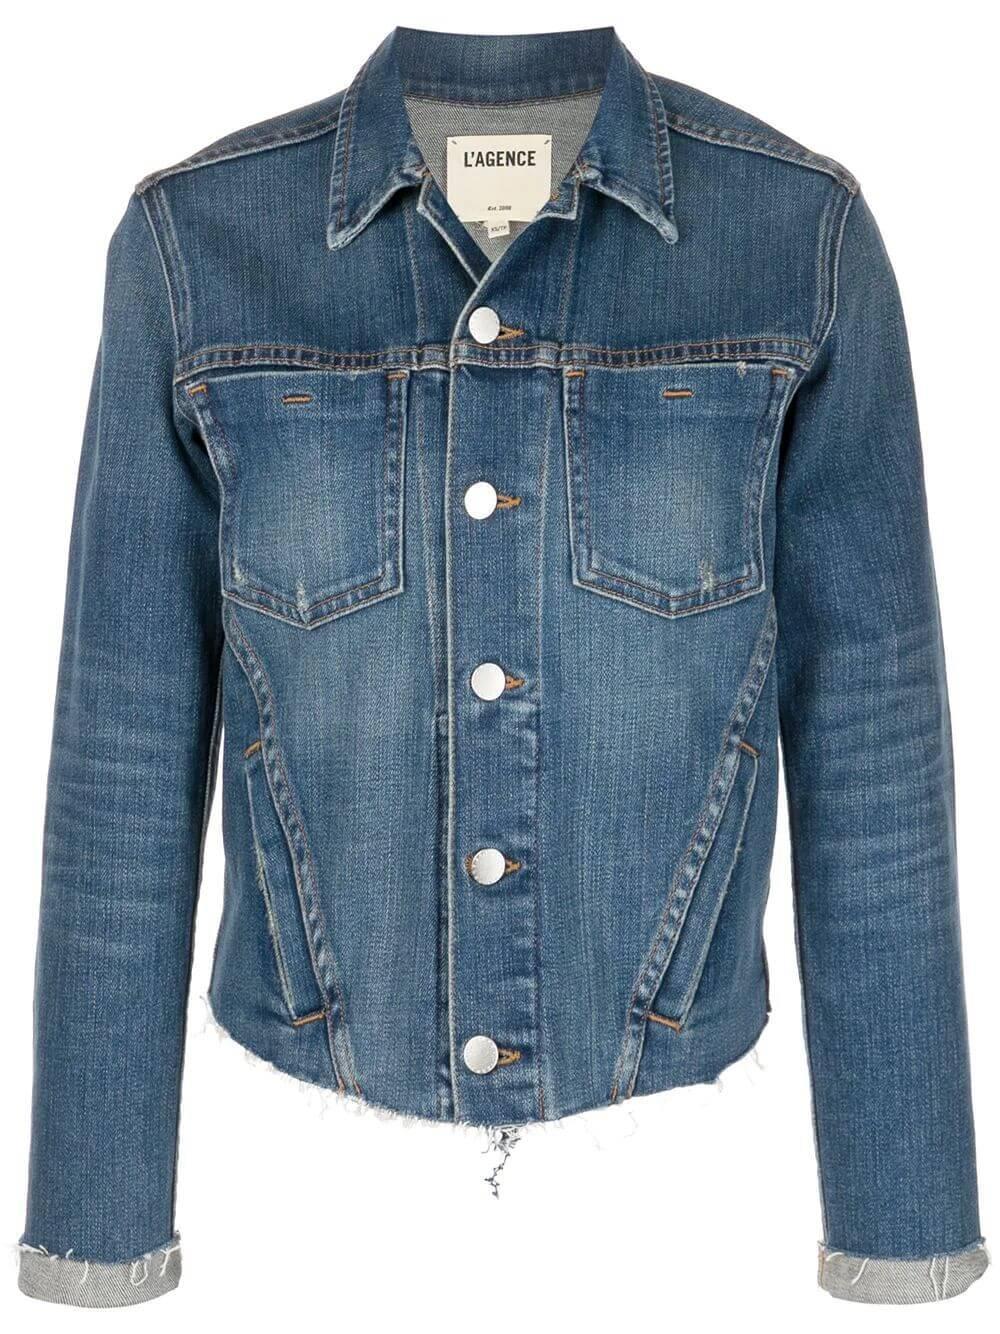 Janelle Slim Denim Jacket Item # 1431RDM-R20